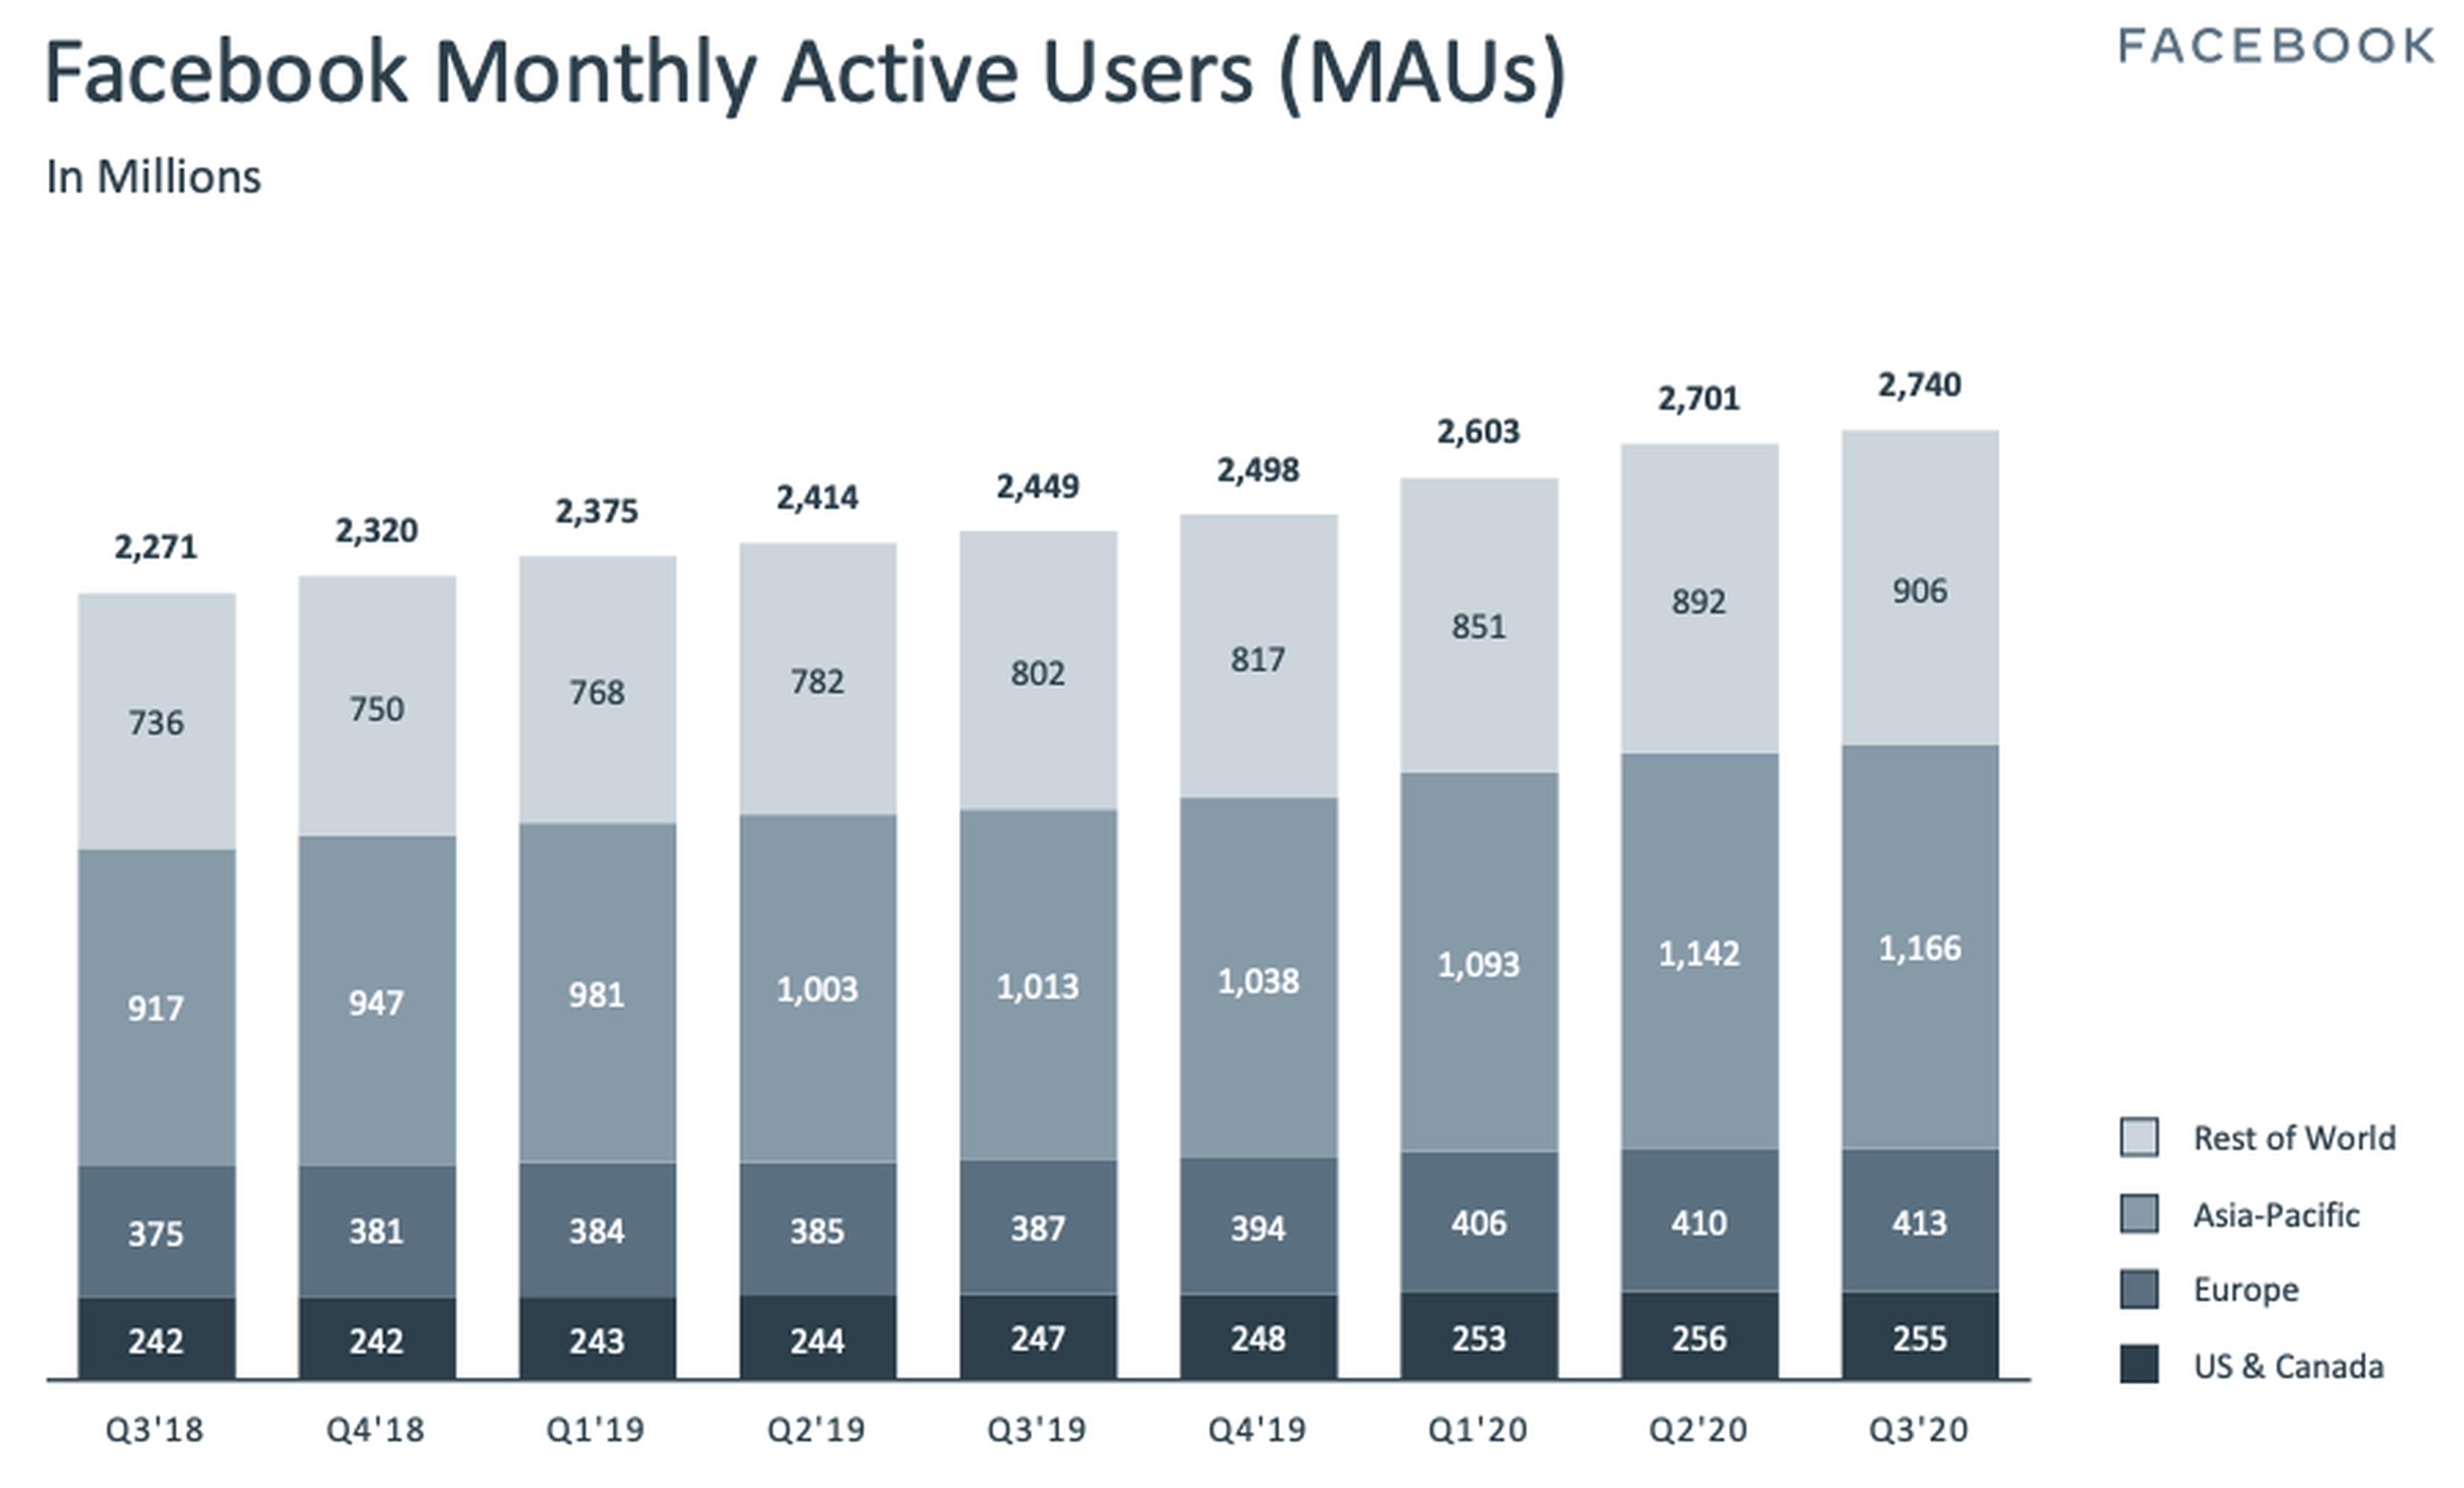 Facebook mengakui pertumbuhan pengguna yang disebabkan oleh pandemi akan segera berakhir